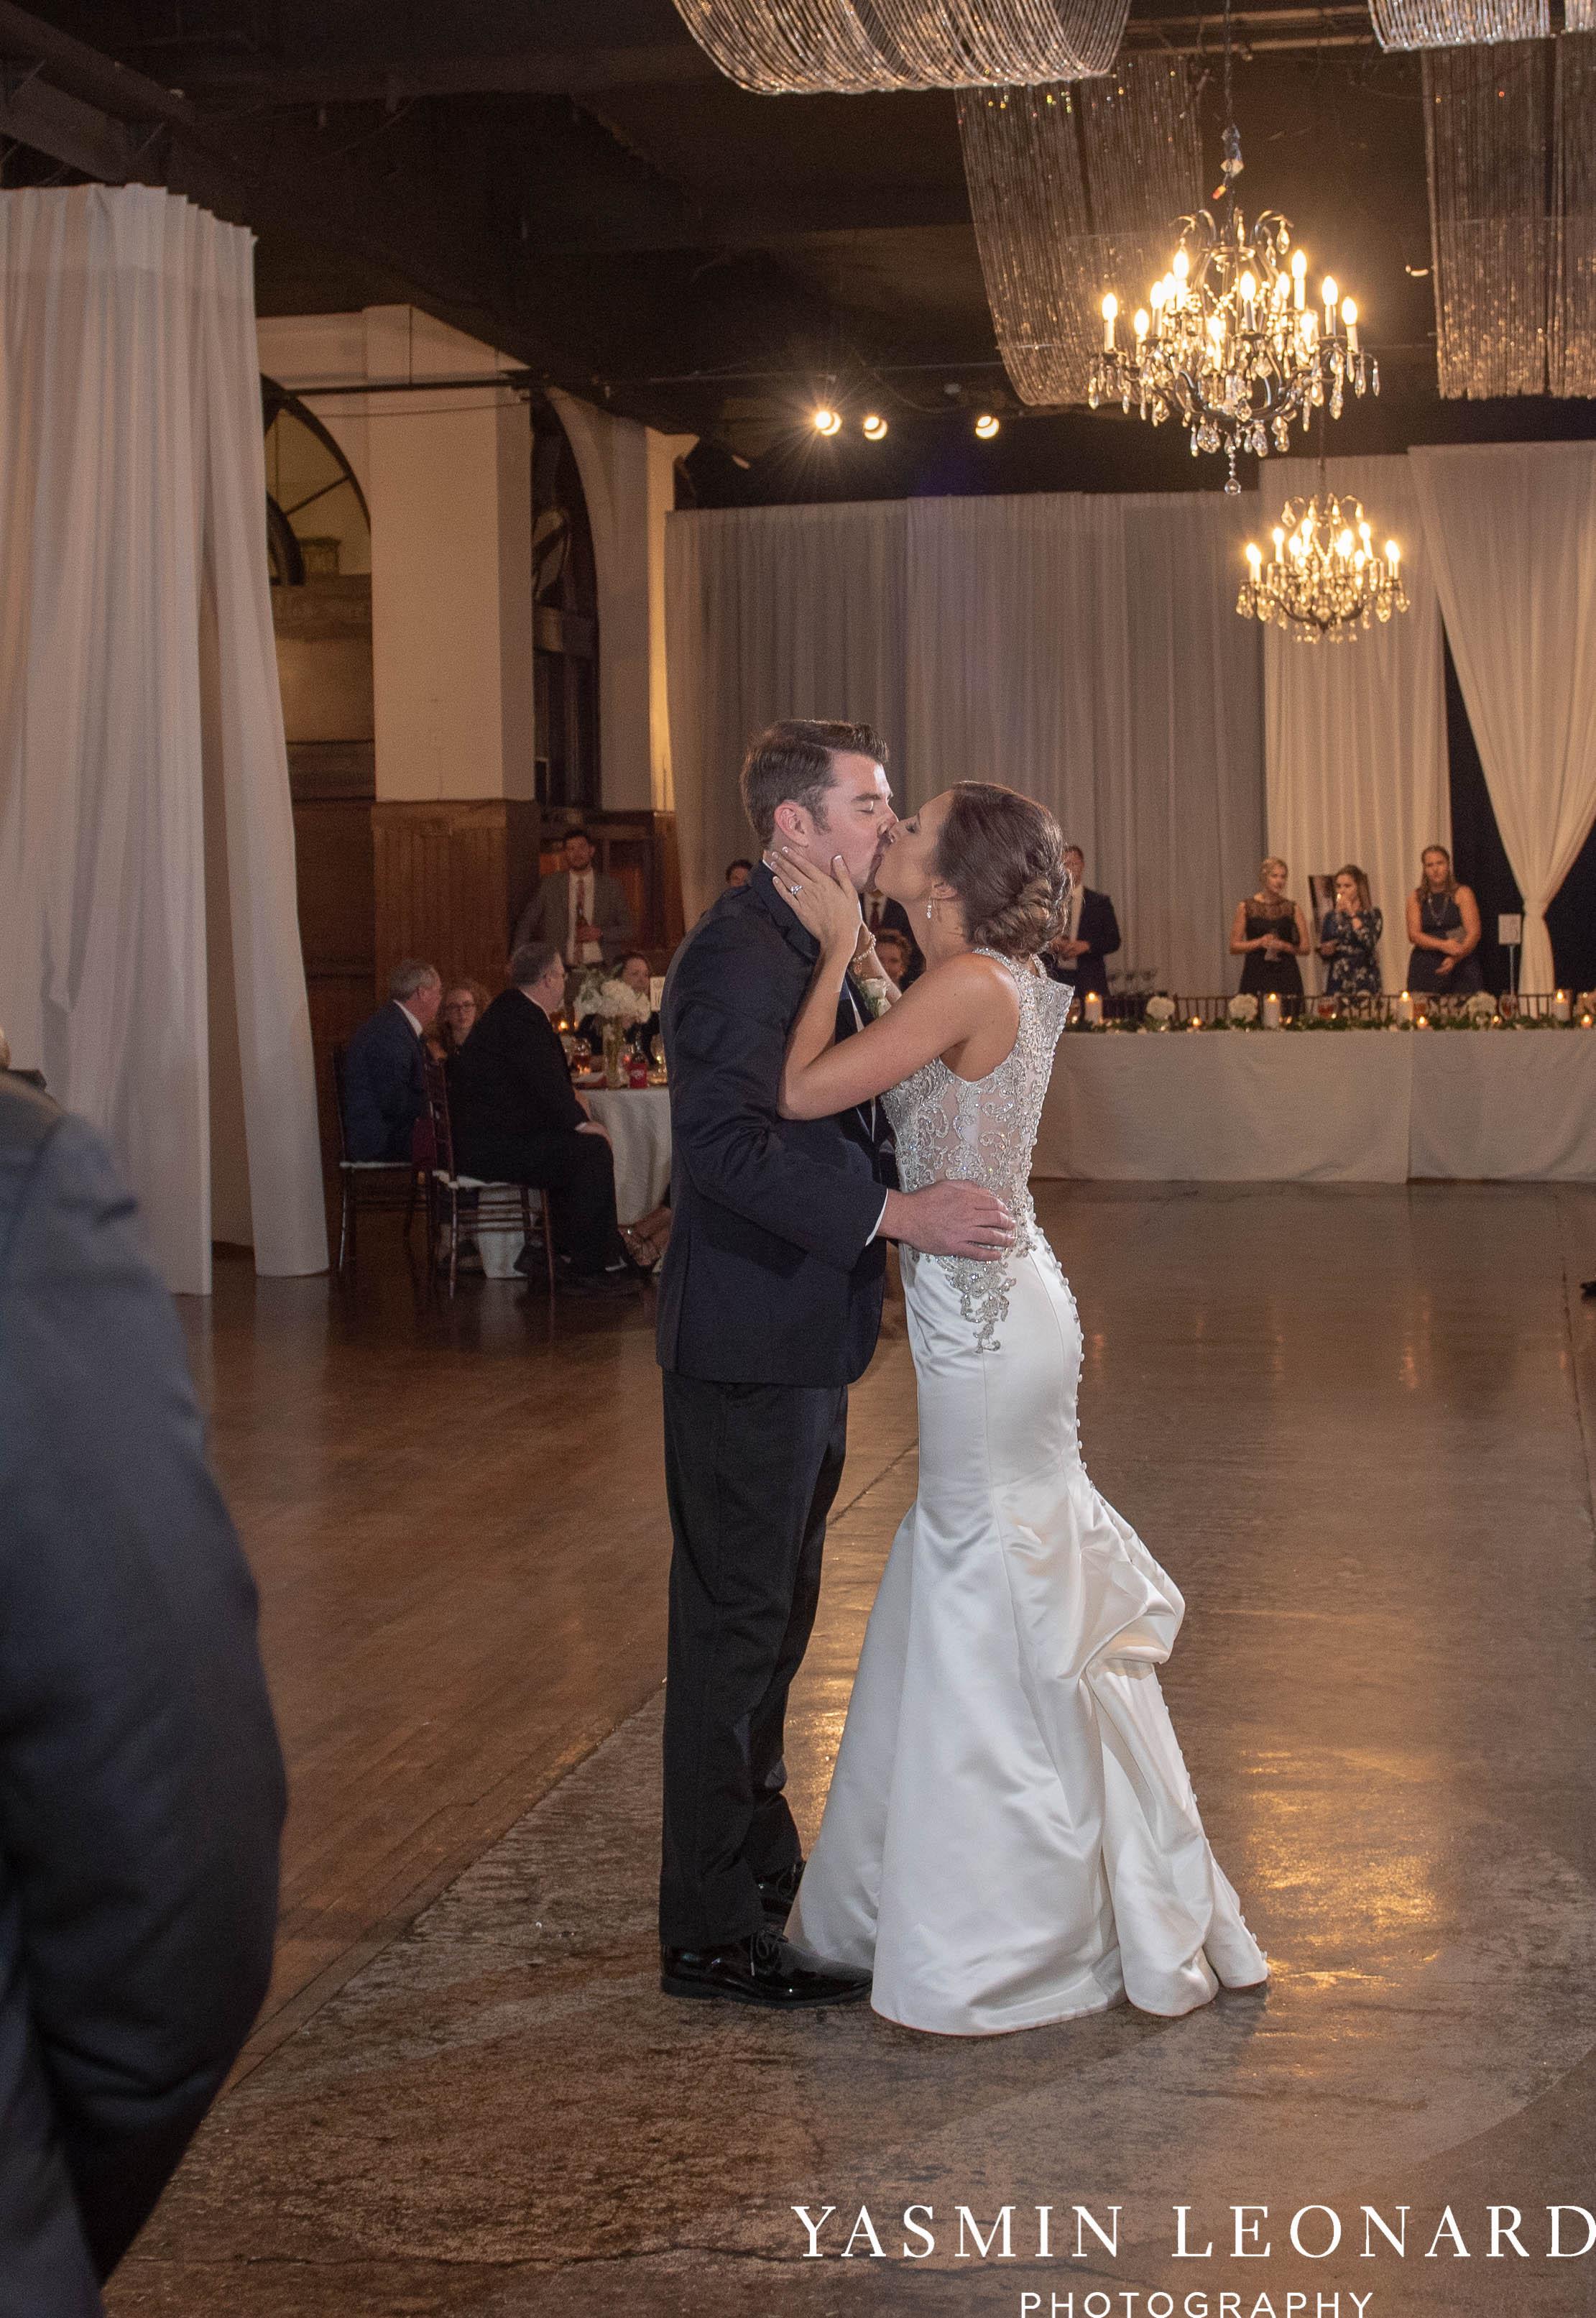 Millennium Center Wedding - Downtown Winston Salem - Winston Salem Wedding Photographer - Winston Salem Venues - Indoor Wedding Venues - NC Wedding Photographer - Yasmin Leonard Photography-73.jpg